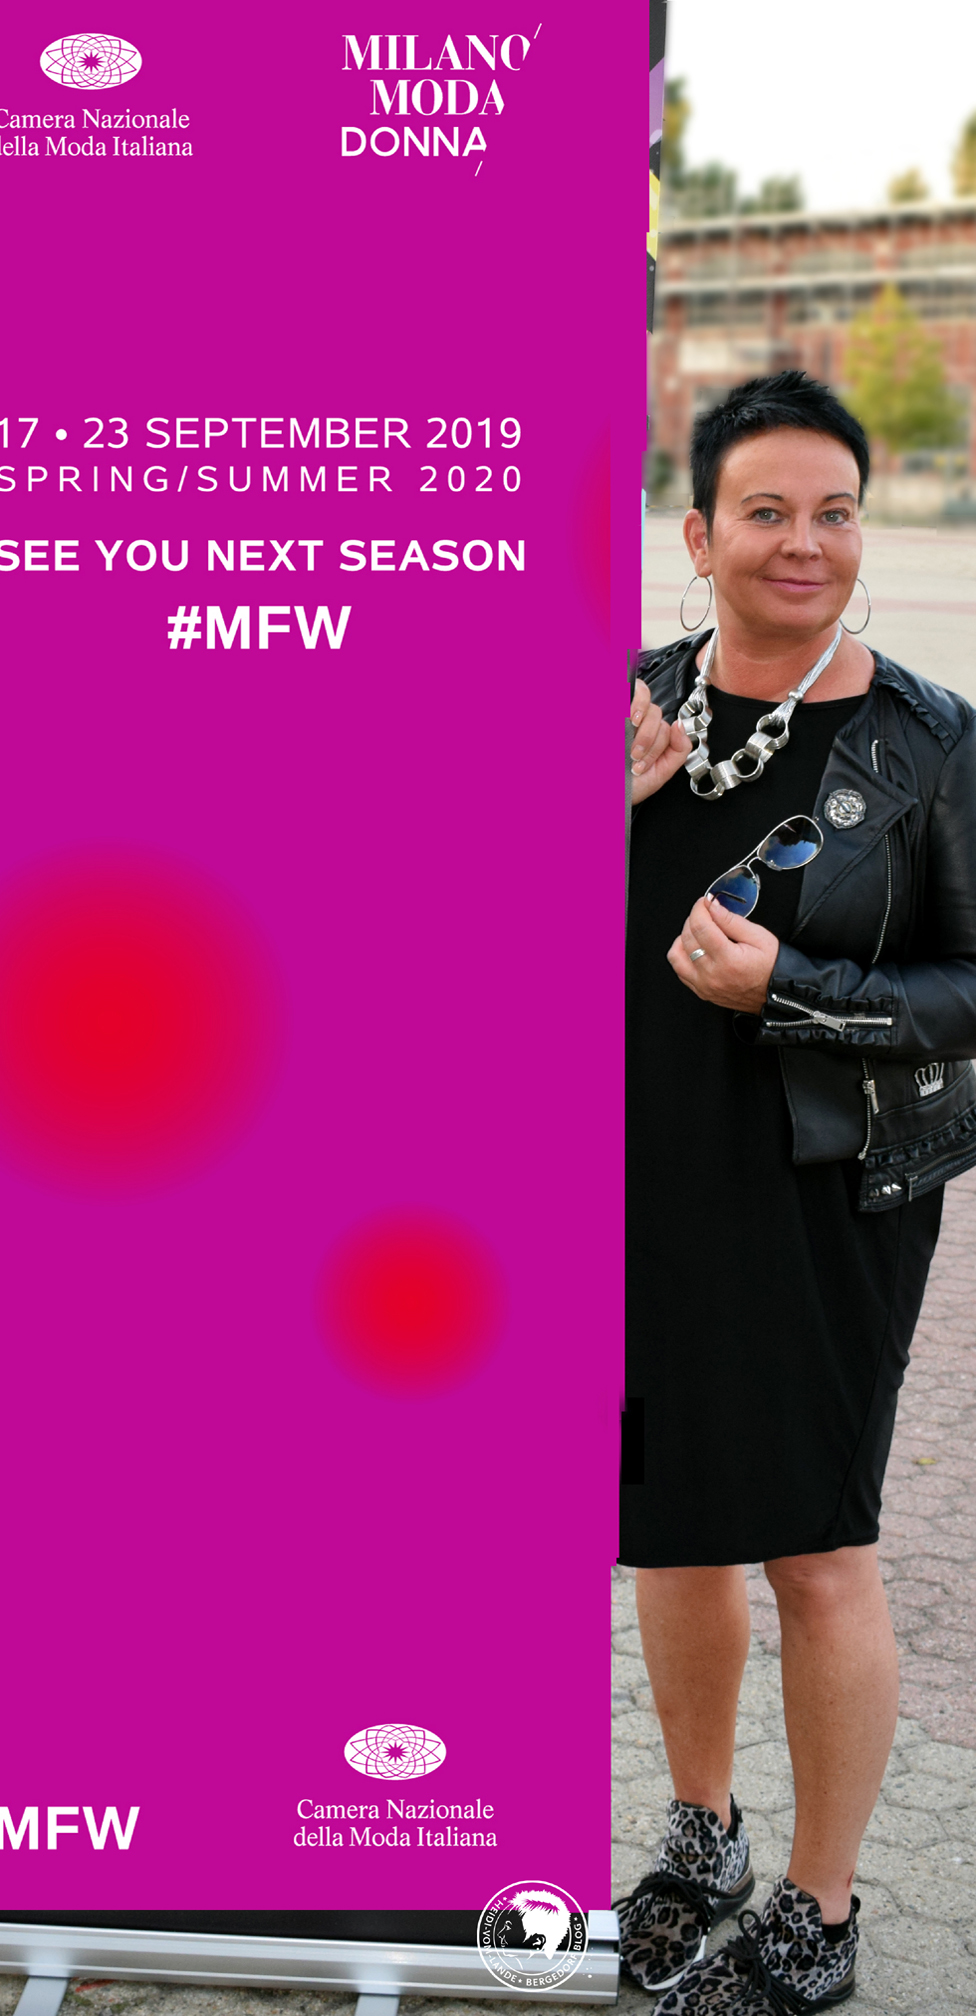 Fashion Week, Modemetropole, Mailand, Milano, Fashion, Trends, Looks, Designer, Fashion Vibes, Laufsteg, Runway Show, Heidi vom Lande, Fashionblogger